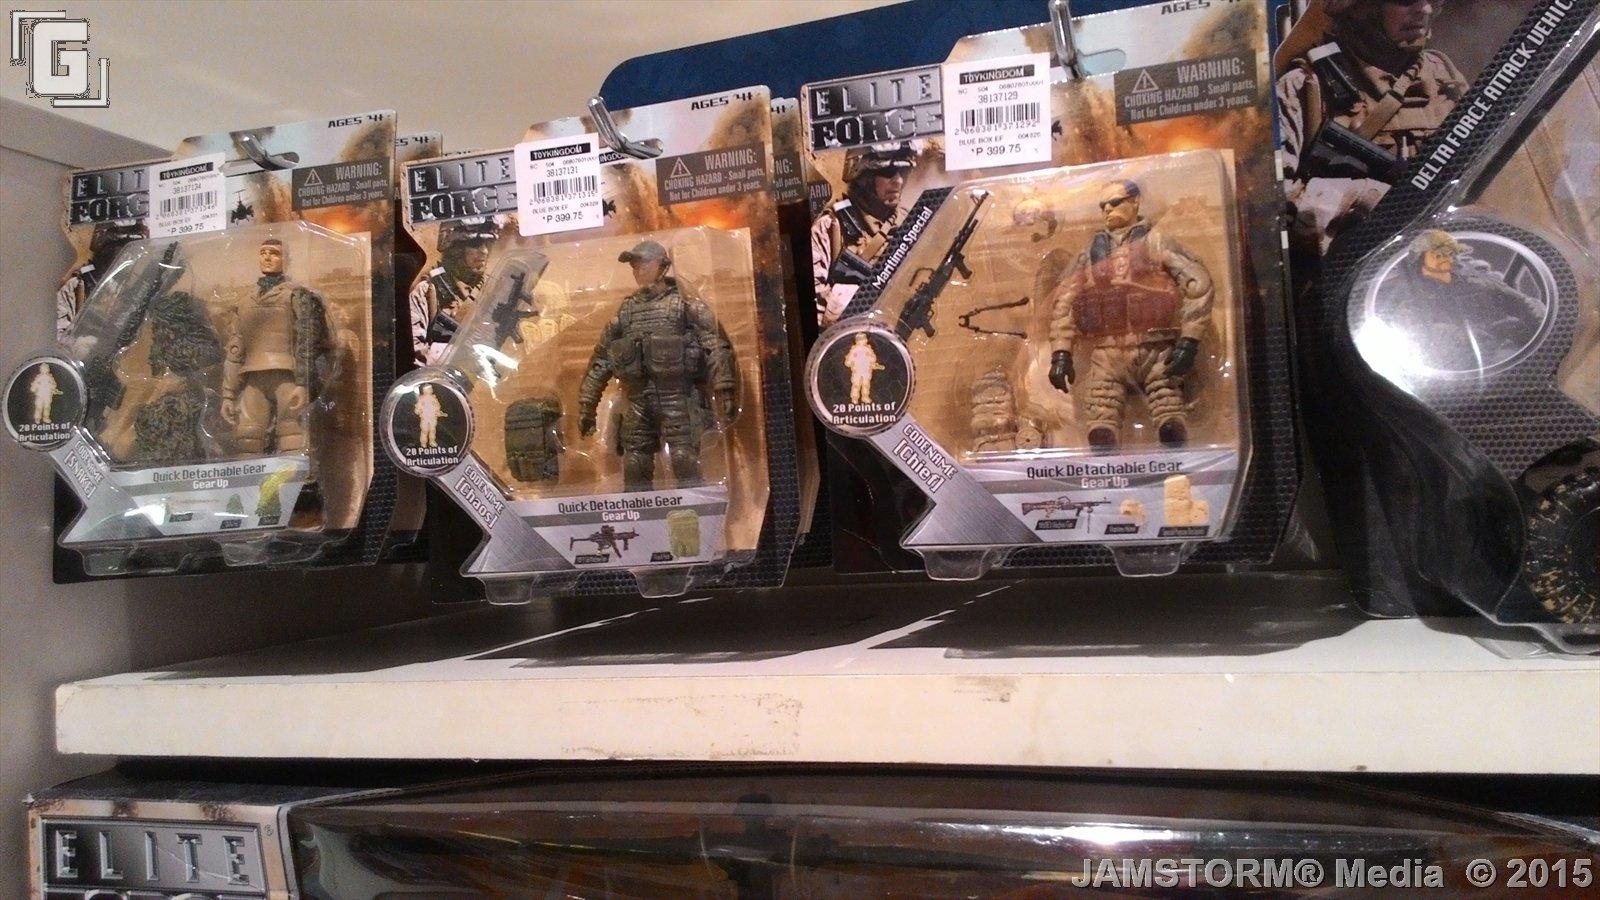 Elite Force 1 18 Toy : Geekmatic toy sightings elite force